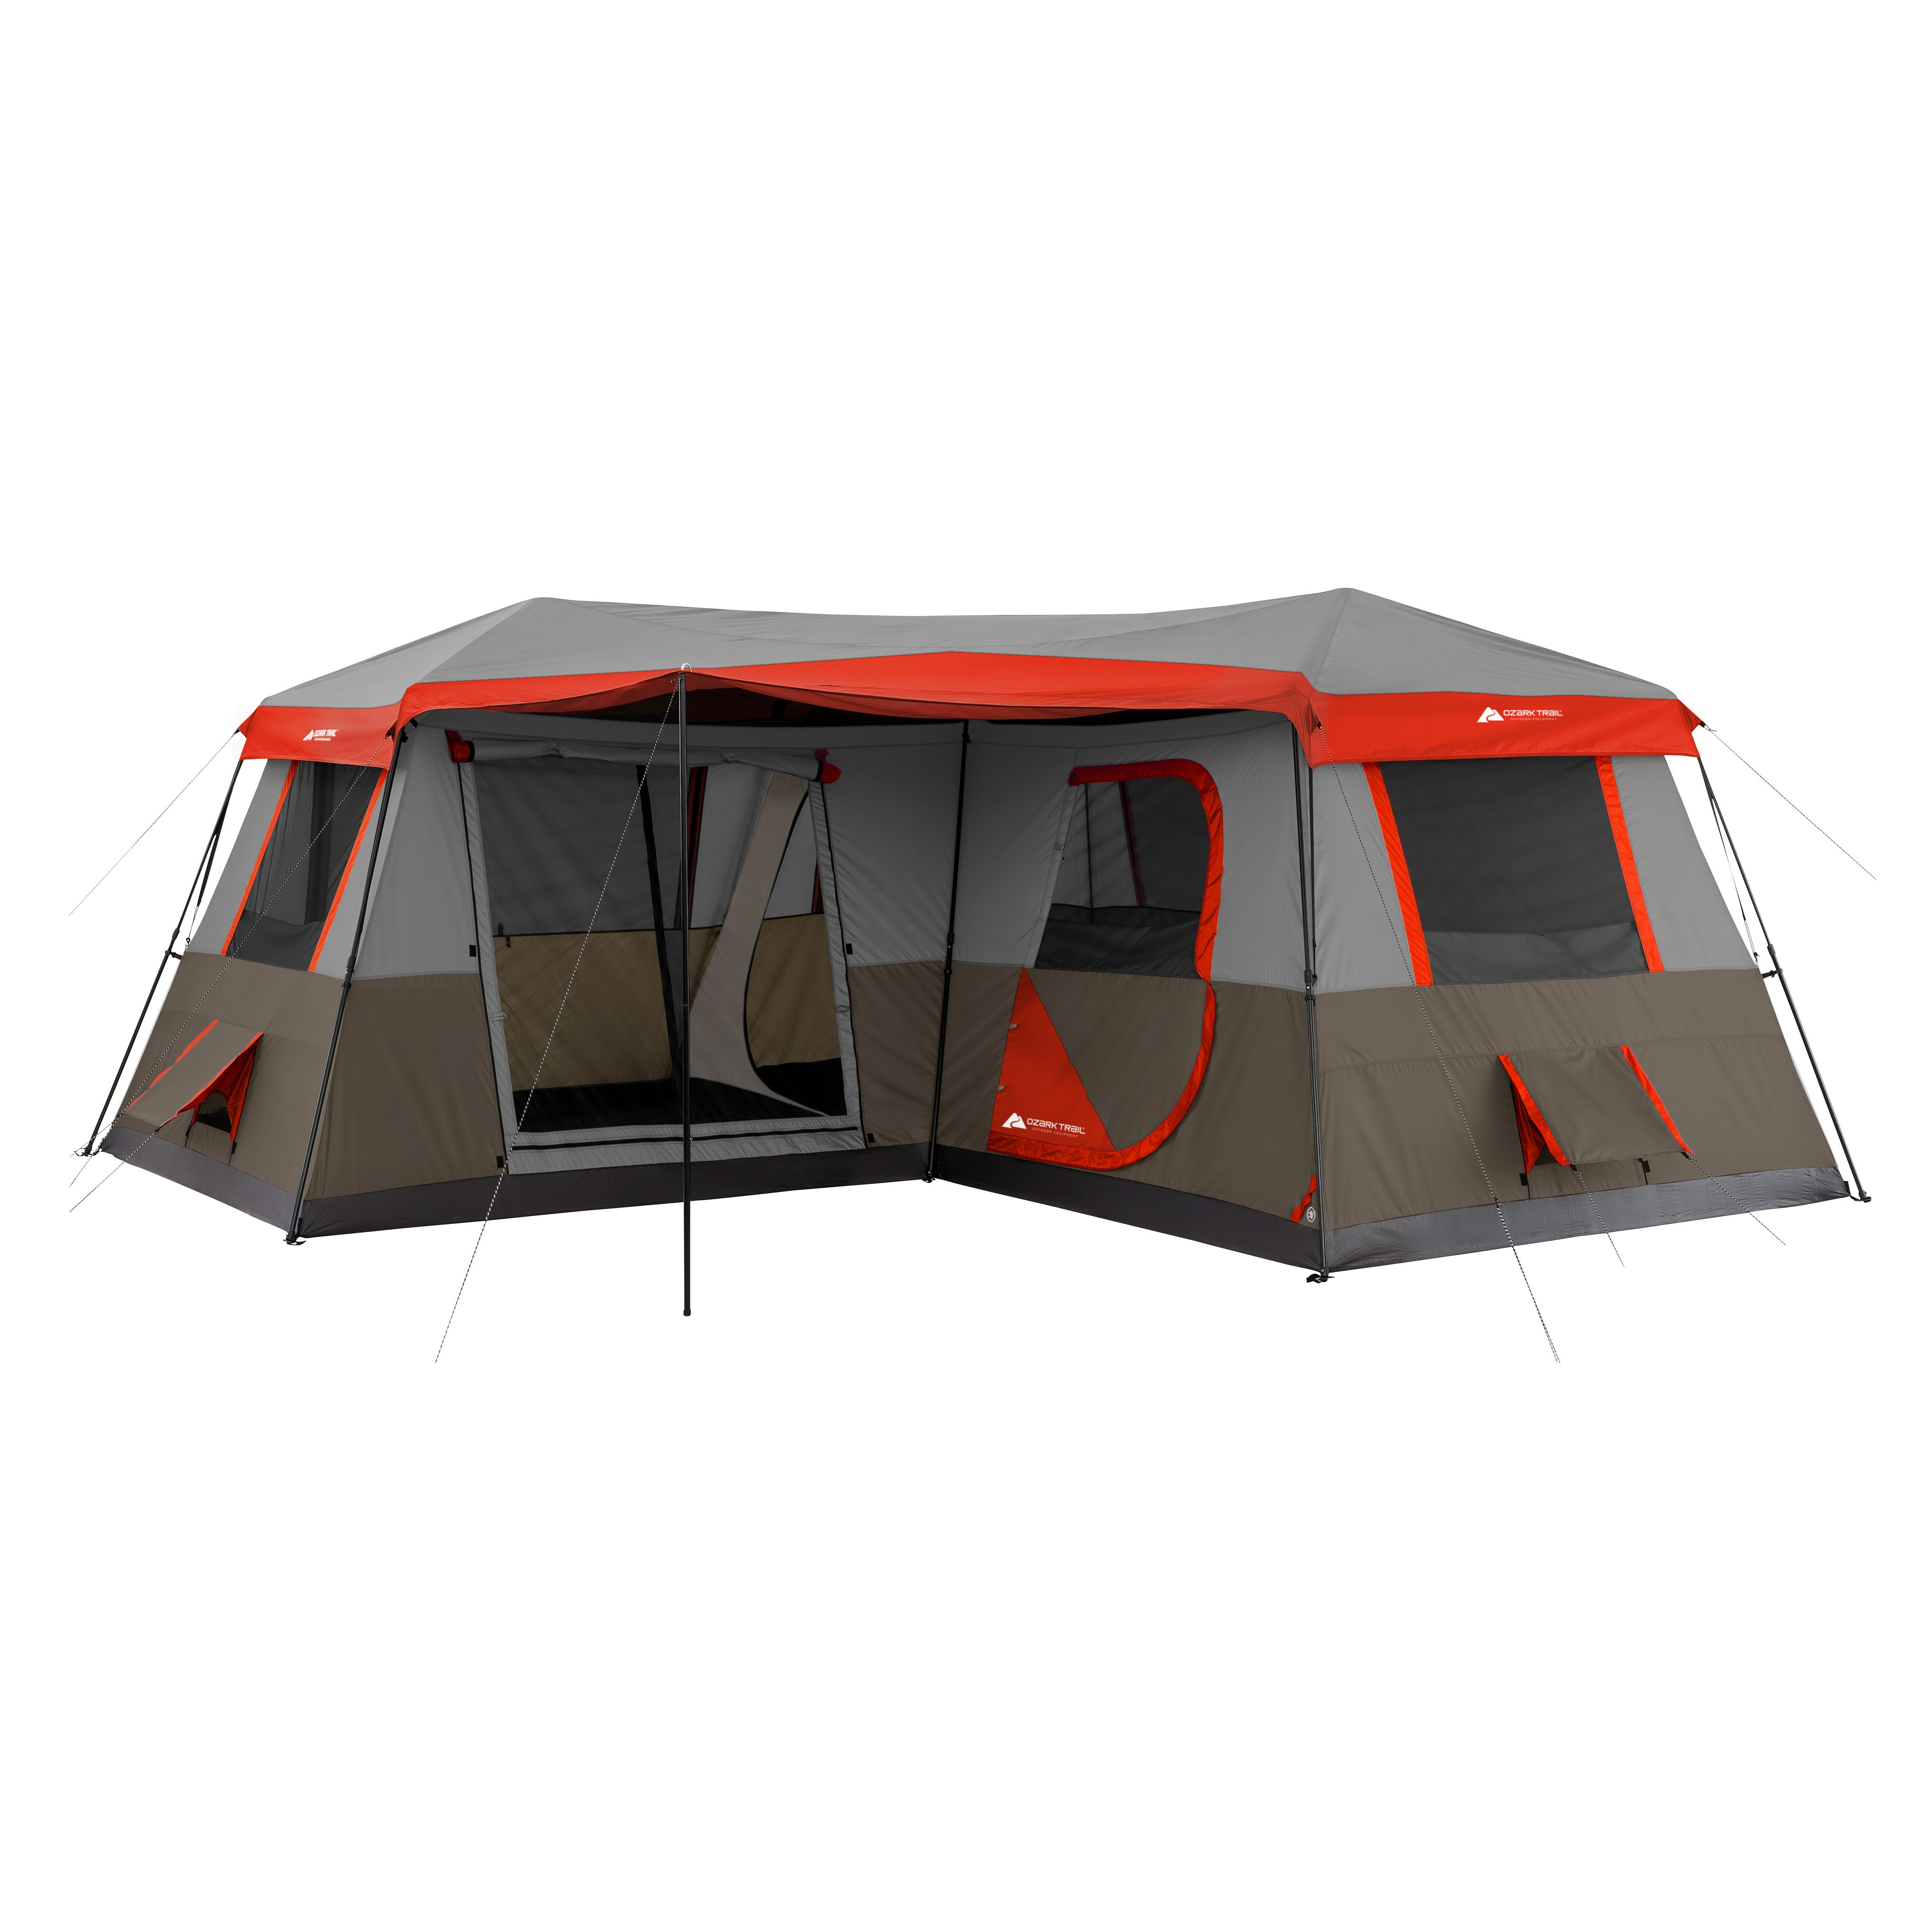 Ozark Trail 16x16 Instant Cabin Tent Sleeps 12 - Walmart com